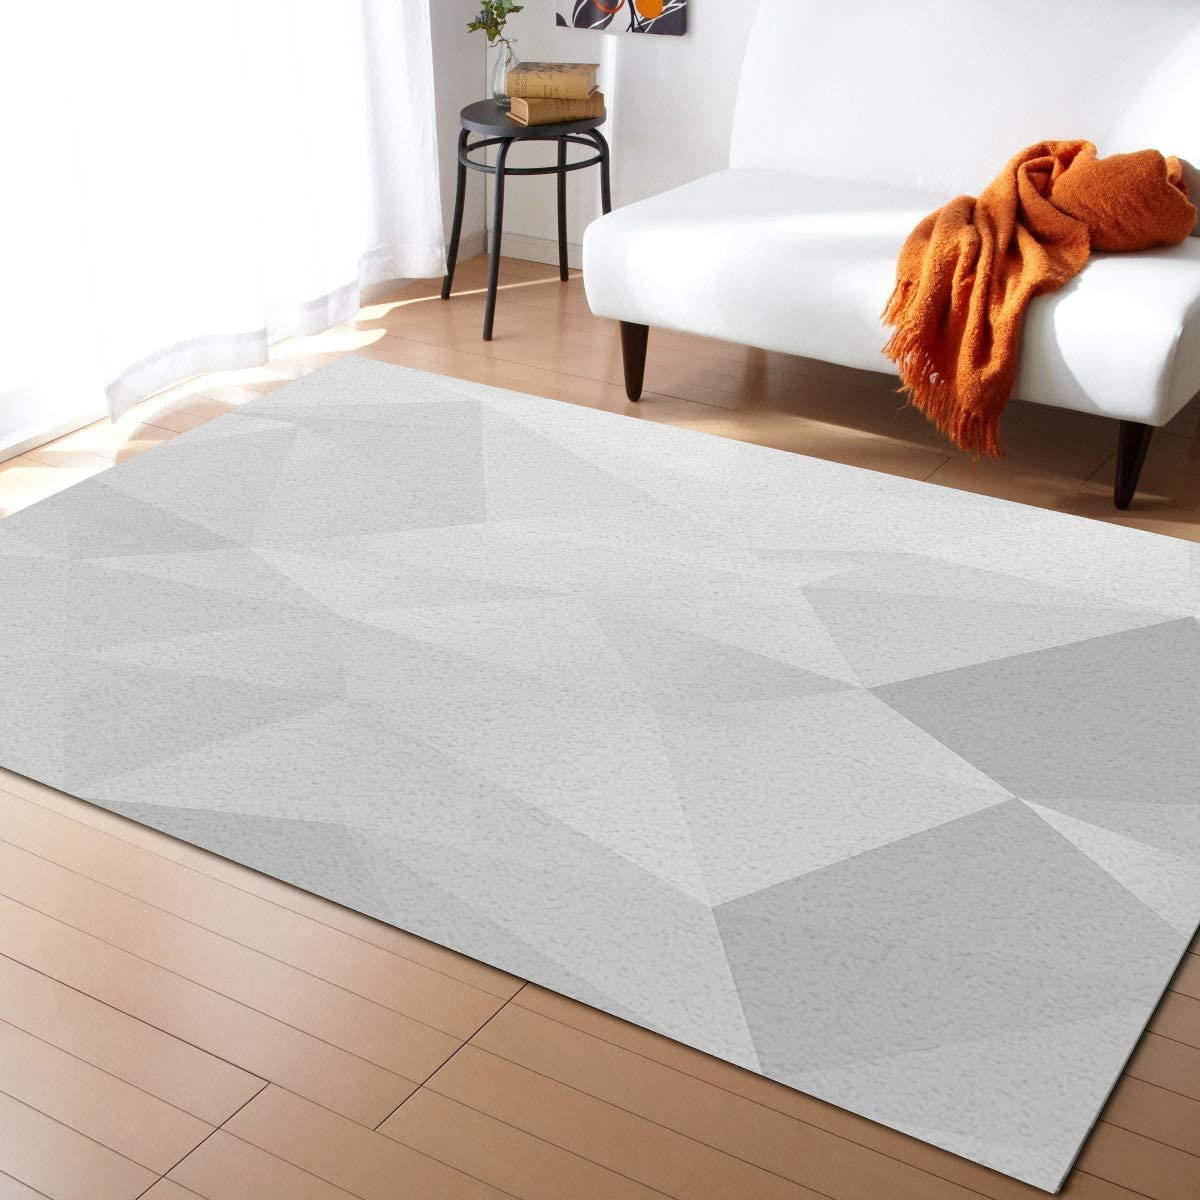 Popular brand Prime Fees free Leader Modern Contemporary Area Room for Living Gray Rug